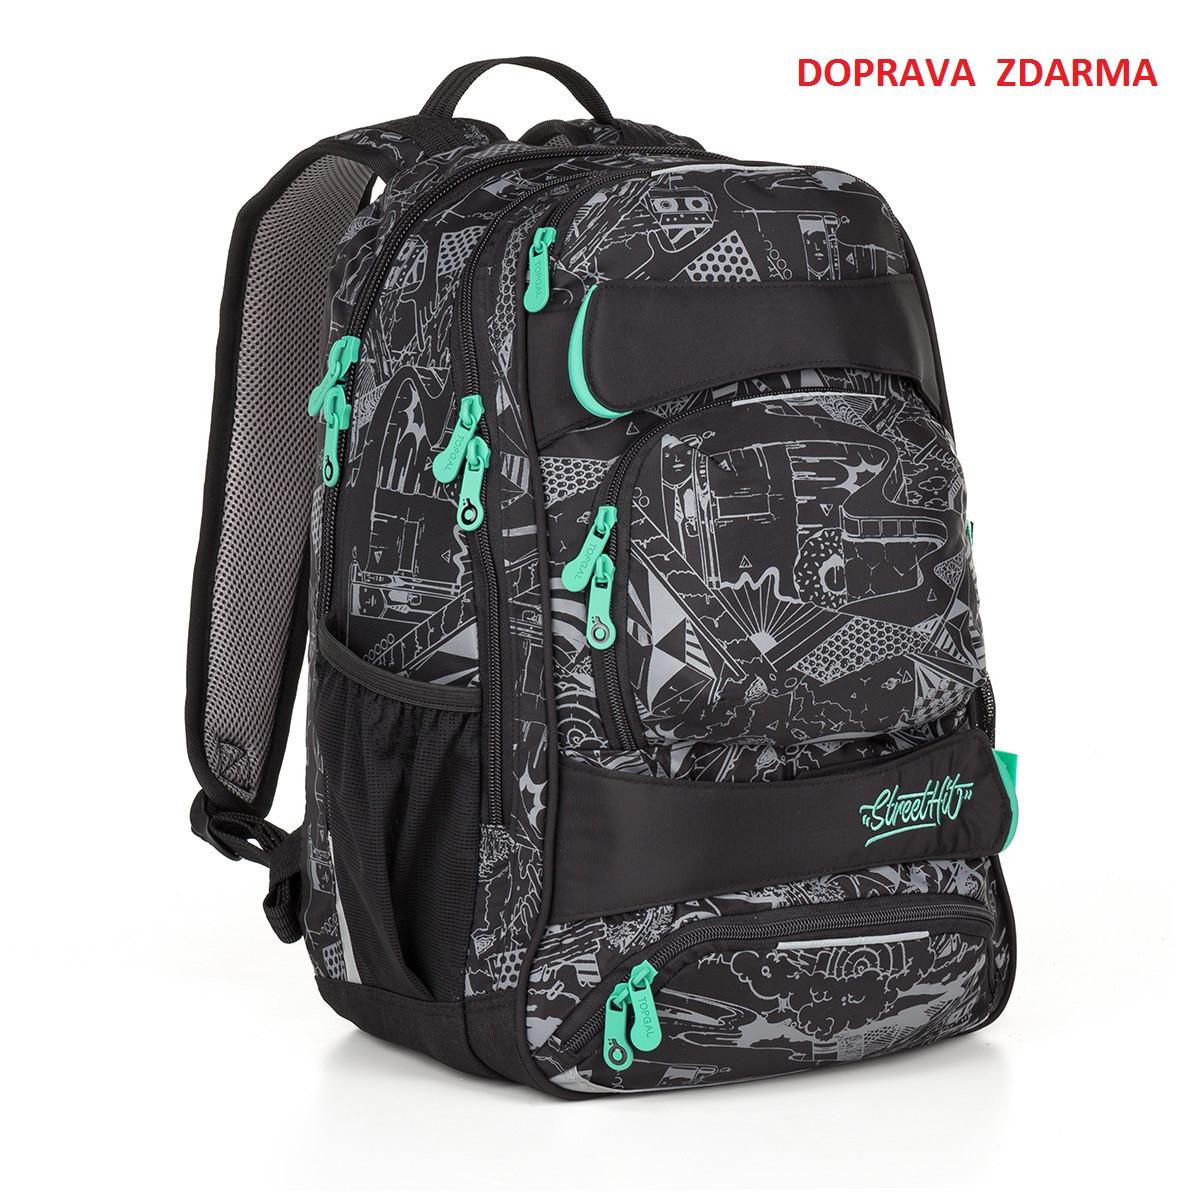 Studentský batoh Topgal YUMI 18028 B - Macíčkovy hračky 274005ee91